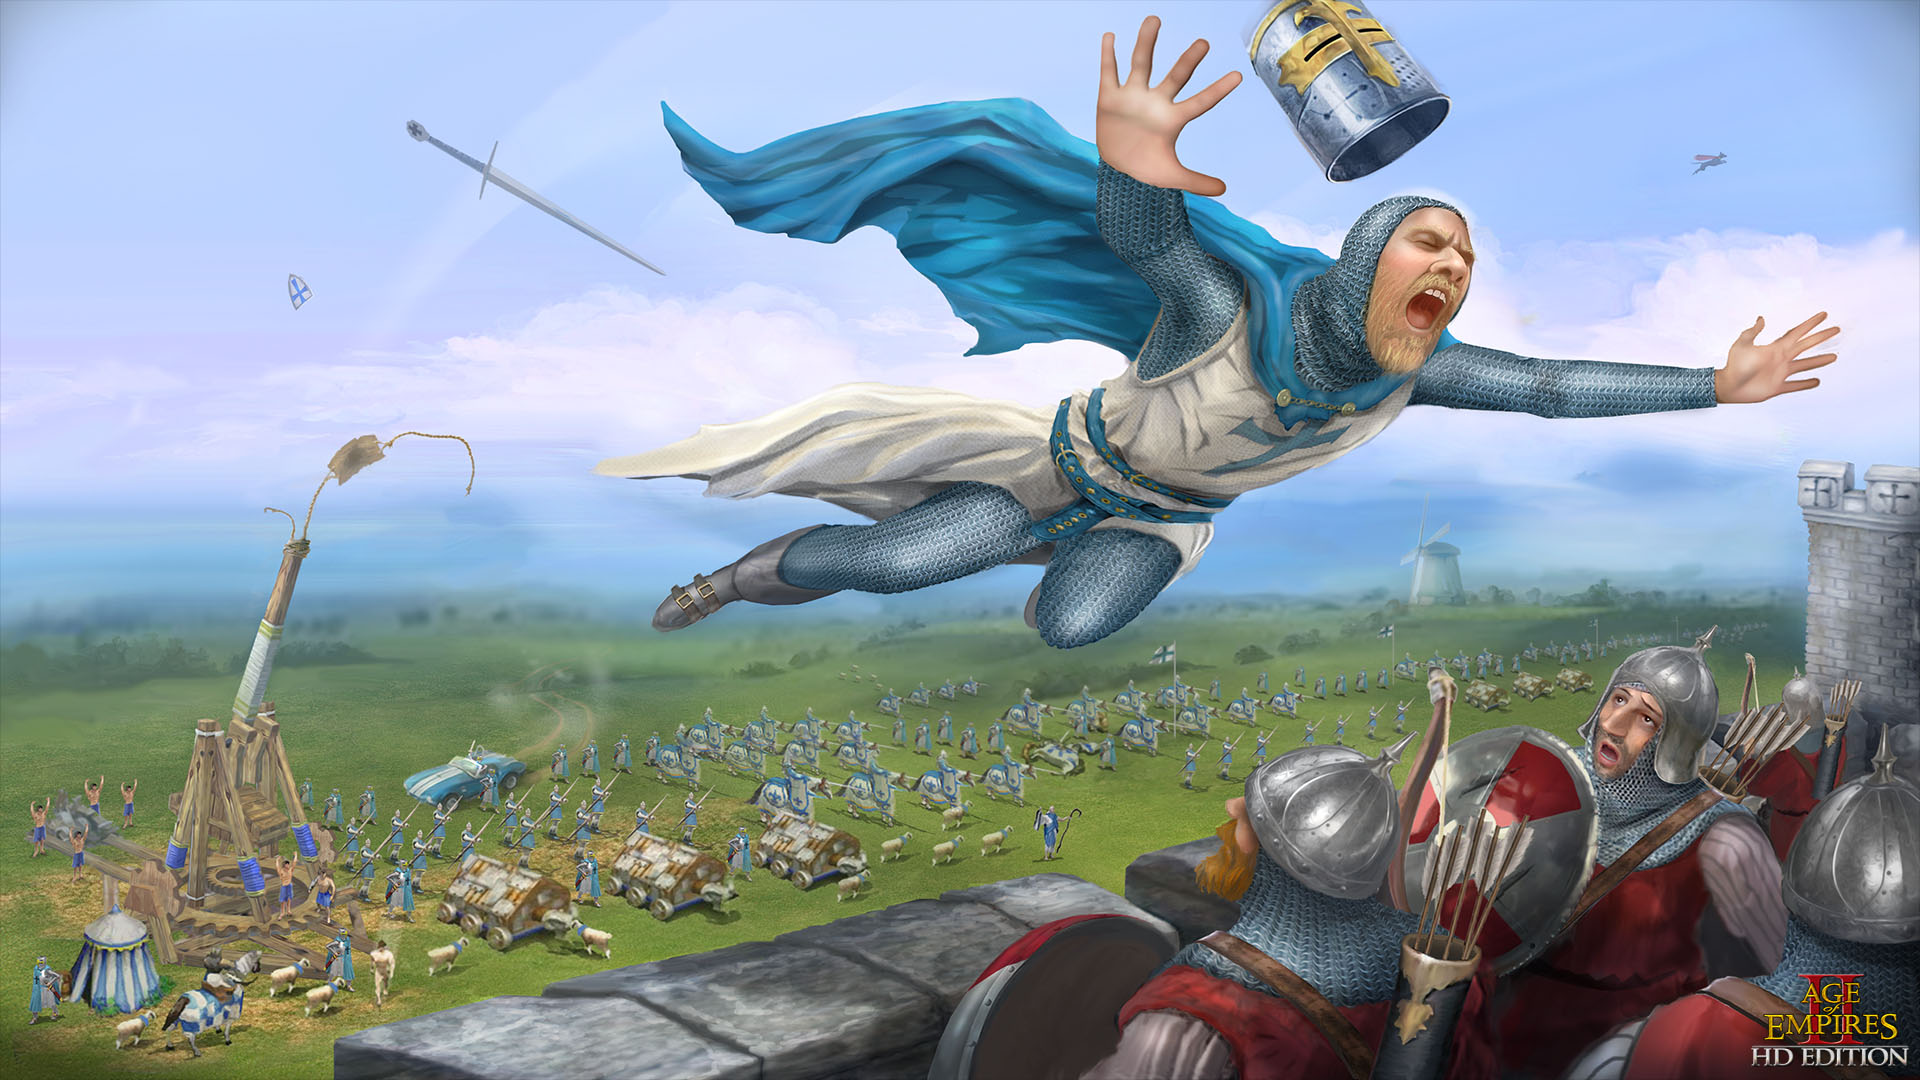 Age of Empires II siege wih cobra car | Age of Empires Cobra Car